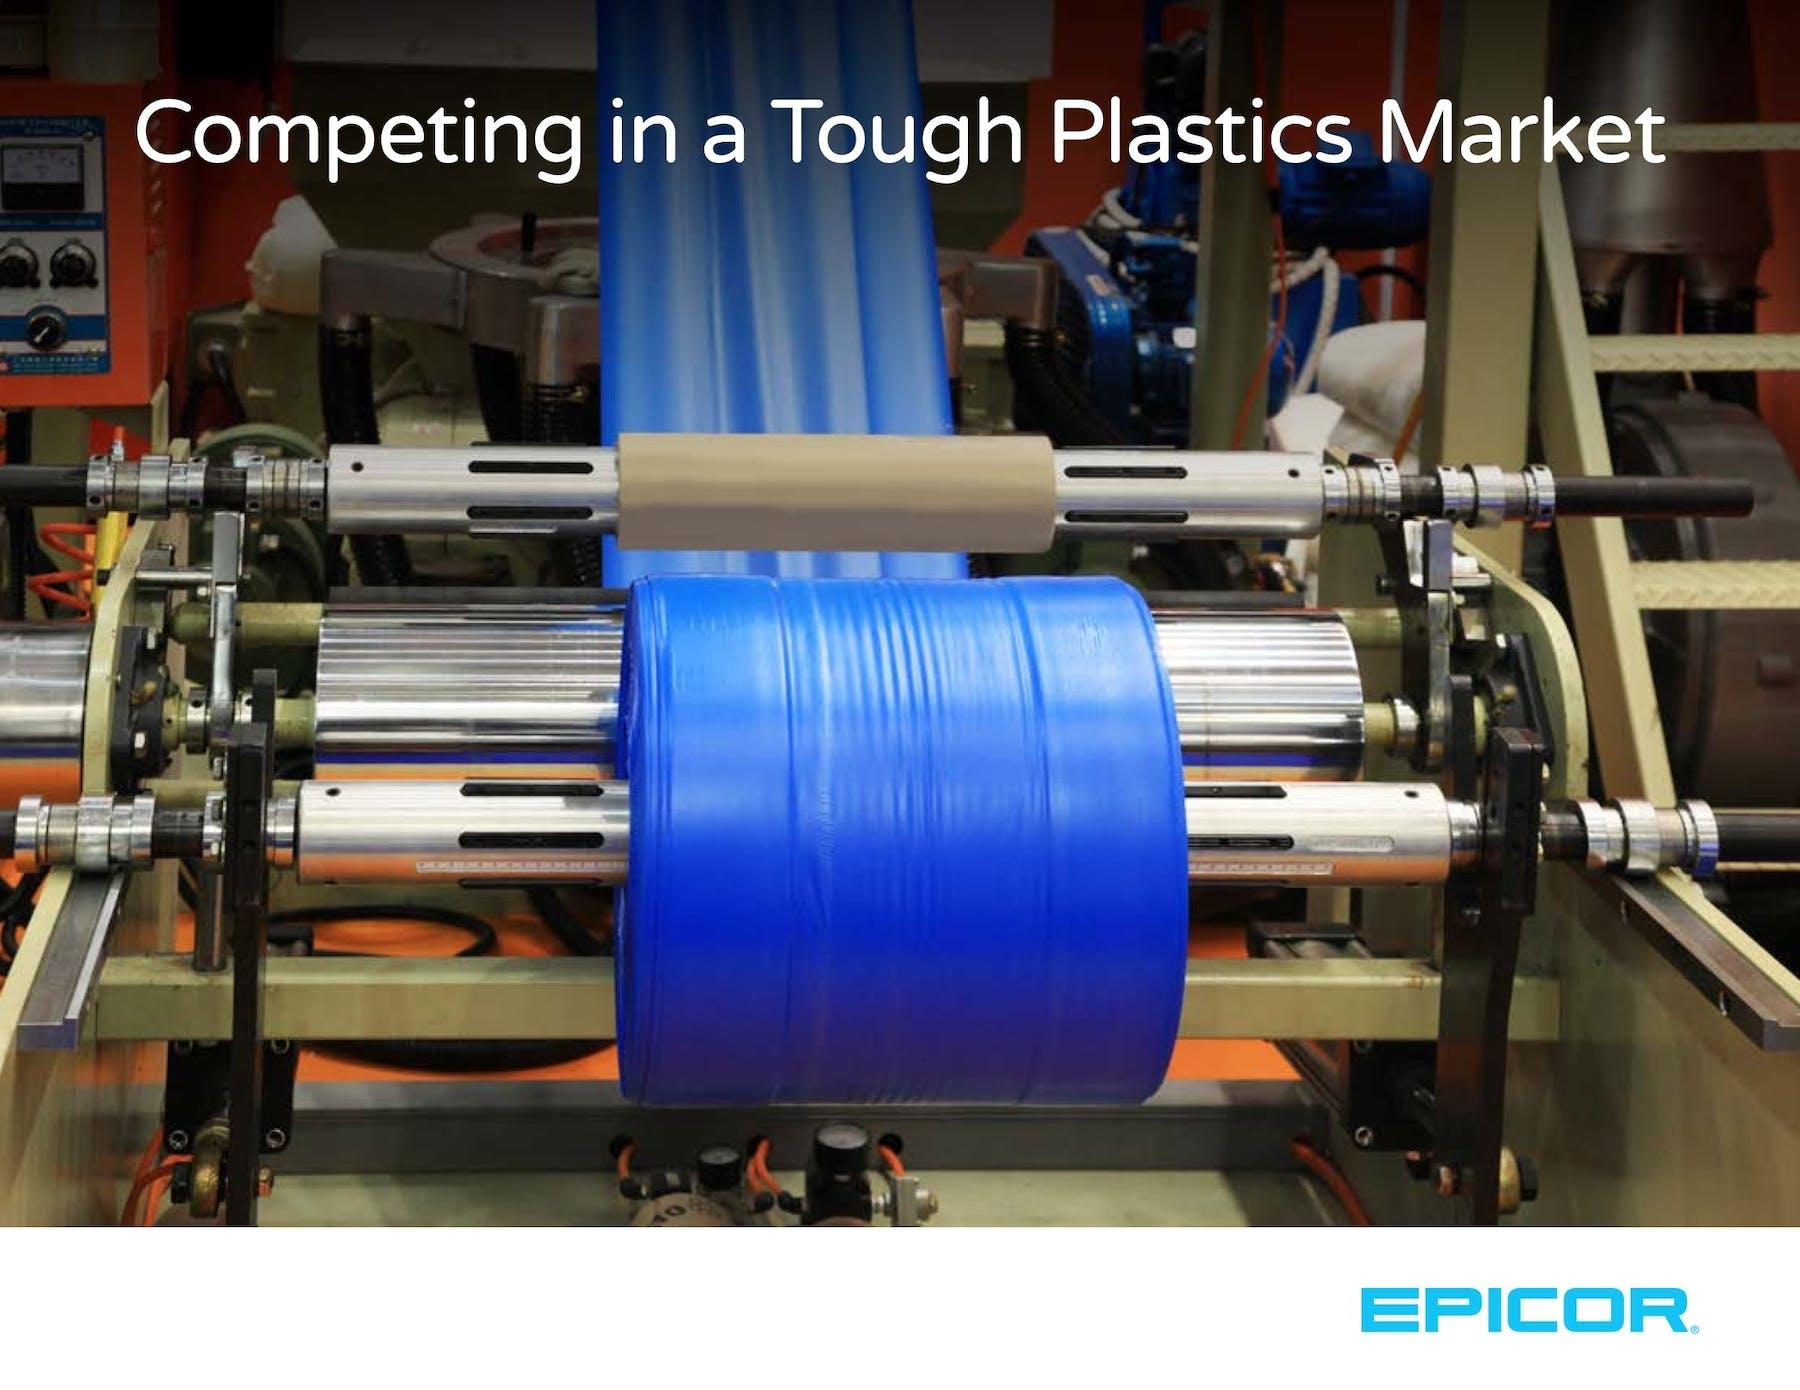 Epicor Mattec (Advanced MES) White Paper - Competing in a Tough Plastics Market